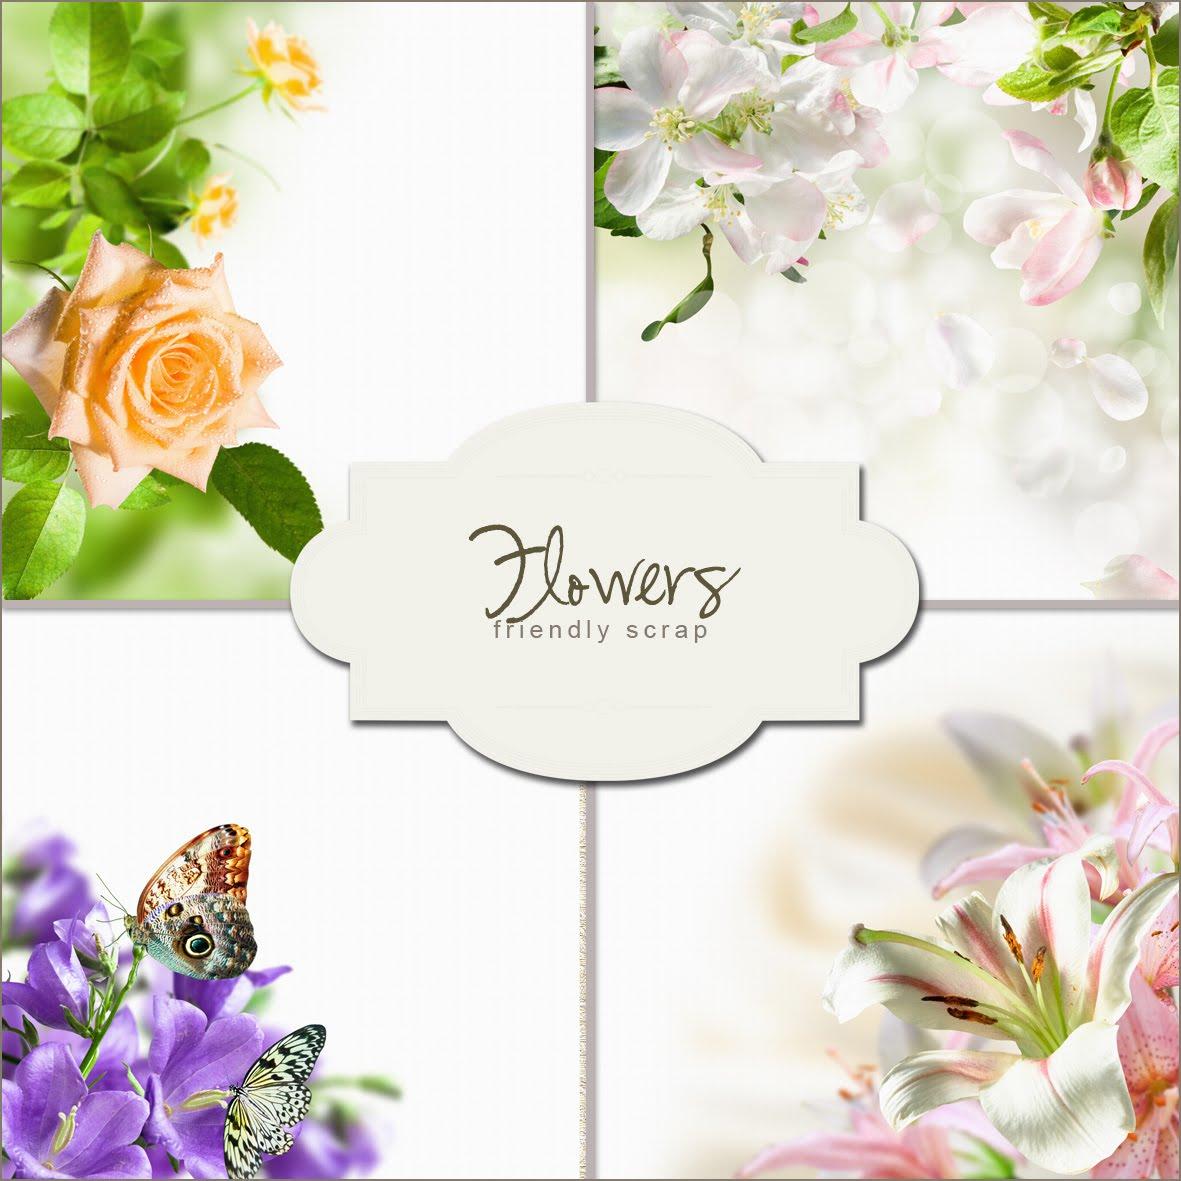 fondos o backgrounds florales gratis